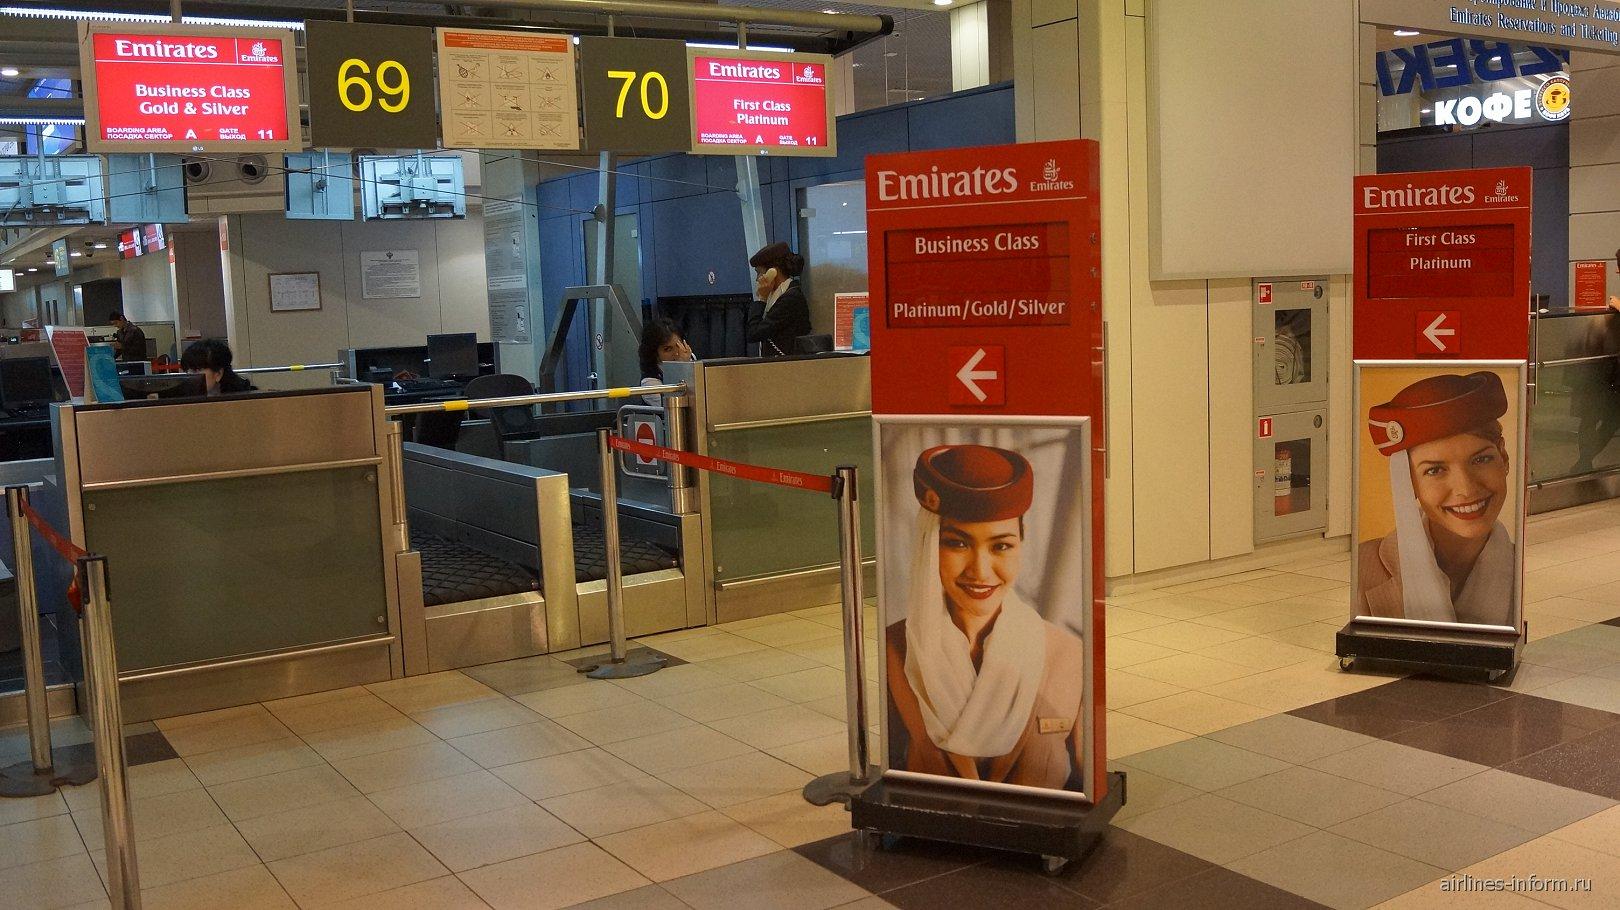 Dme dxb sze with emirates - Emirates airlines paris office ...